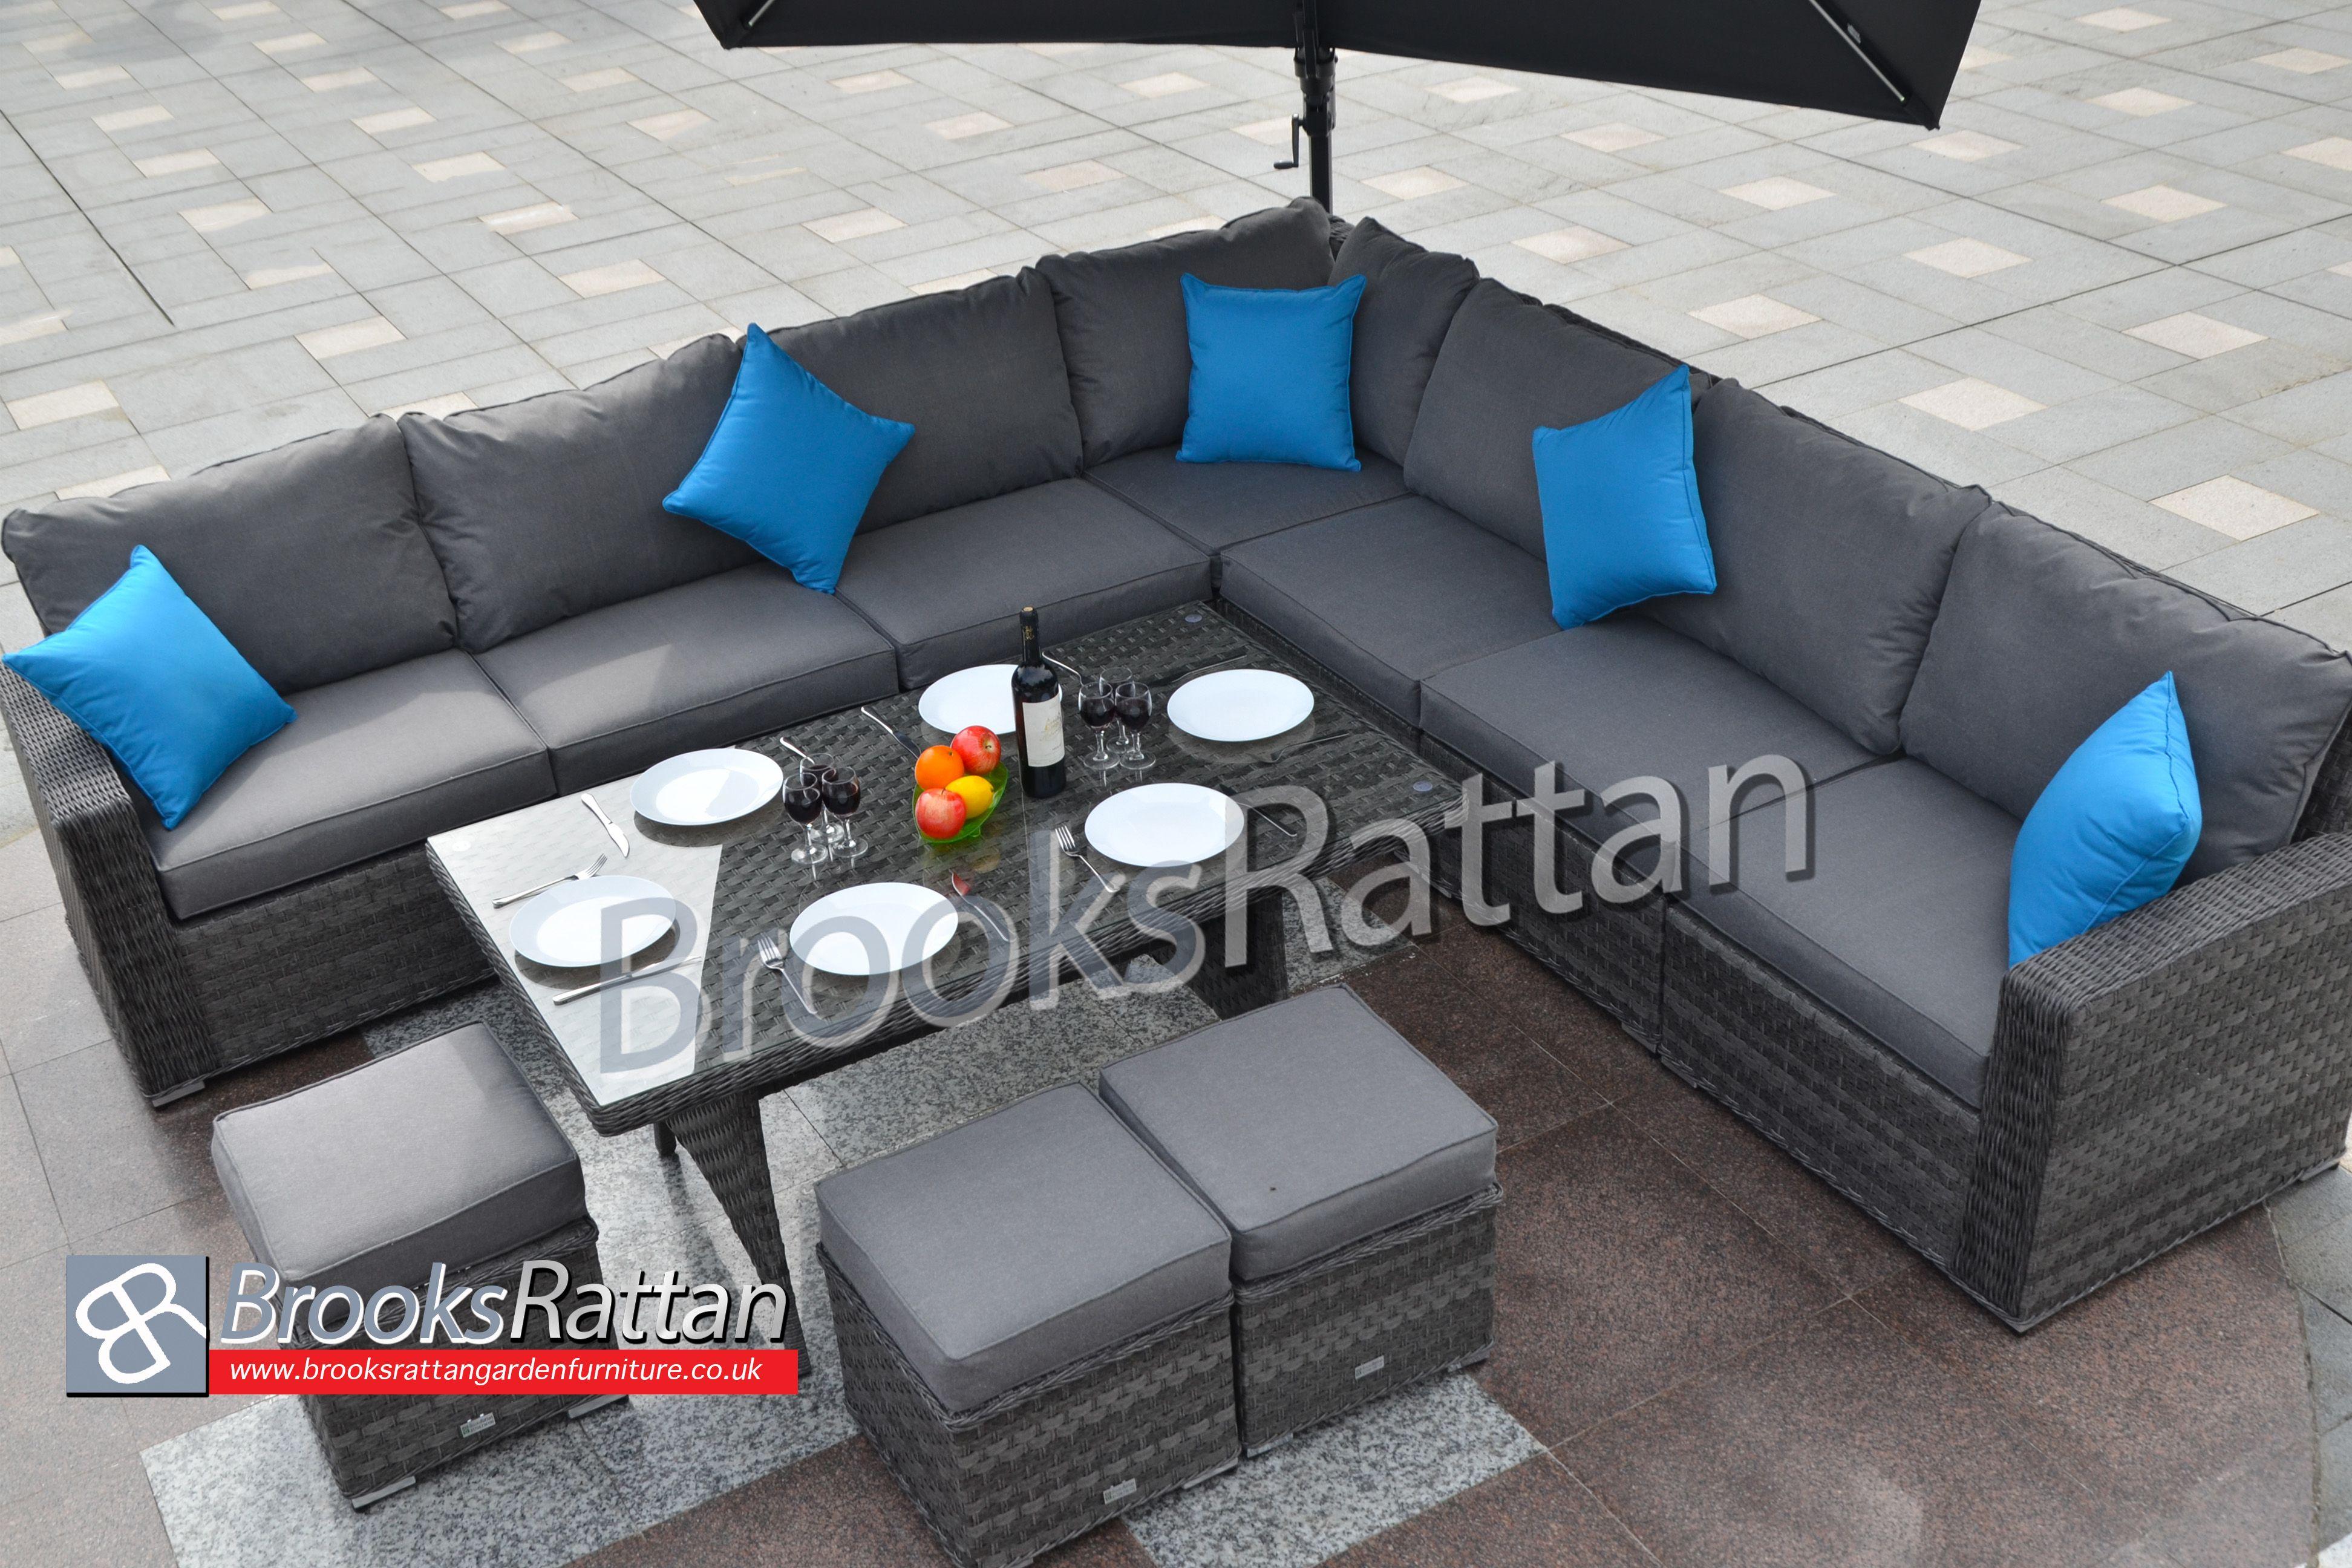 Brooksrattangardenfurniturecouk Corner Dining Serena Seychelles Set Furniture Outdoorfurniture Diningset Sale Essex